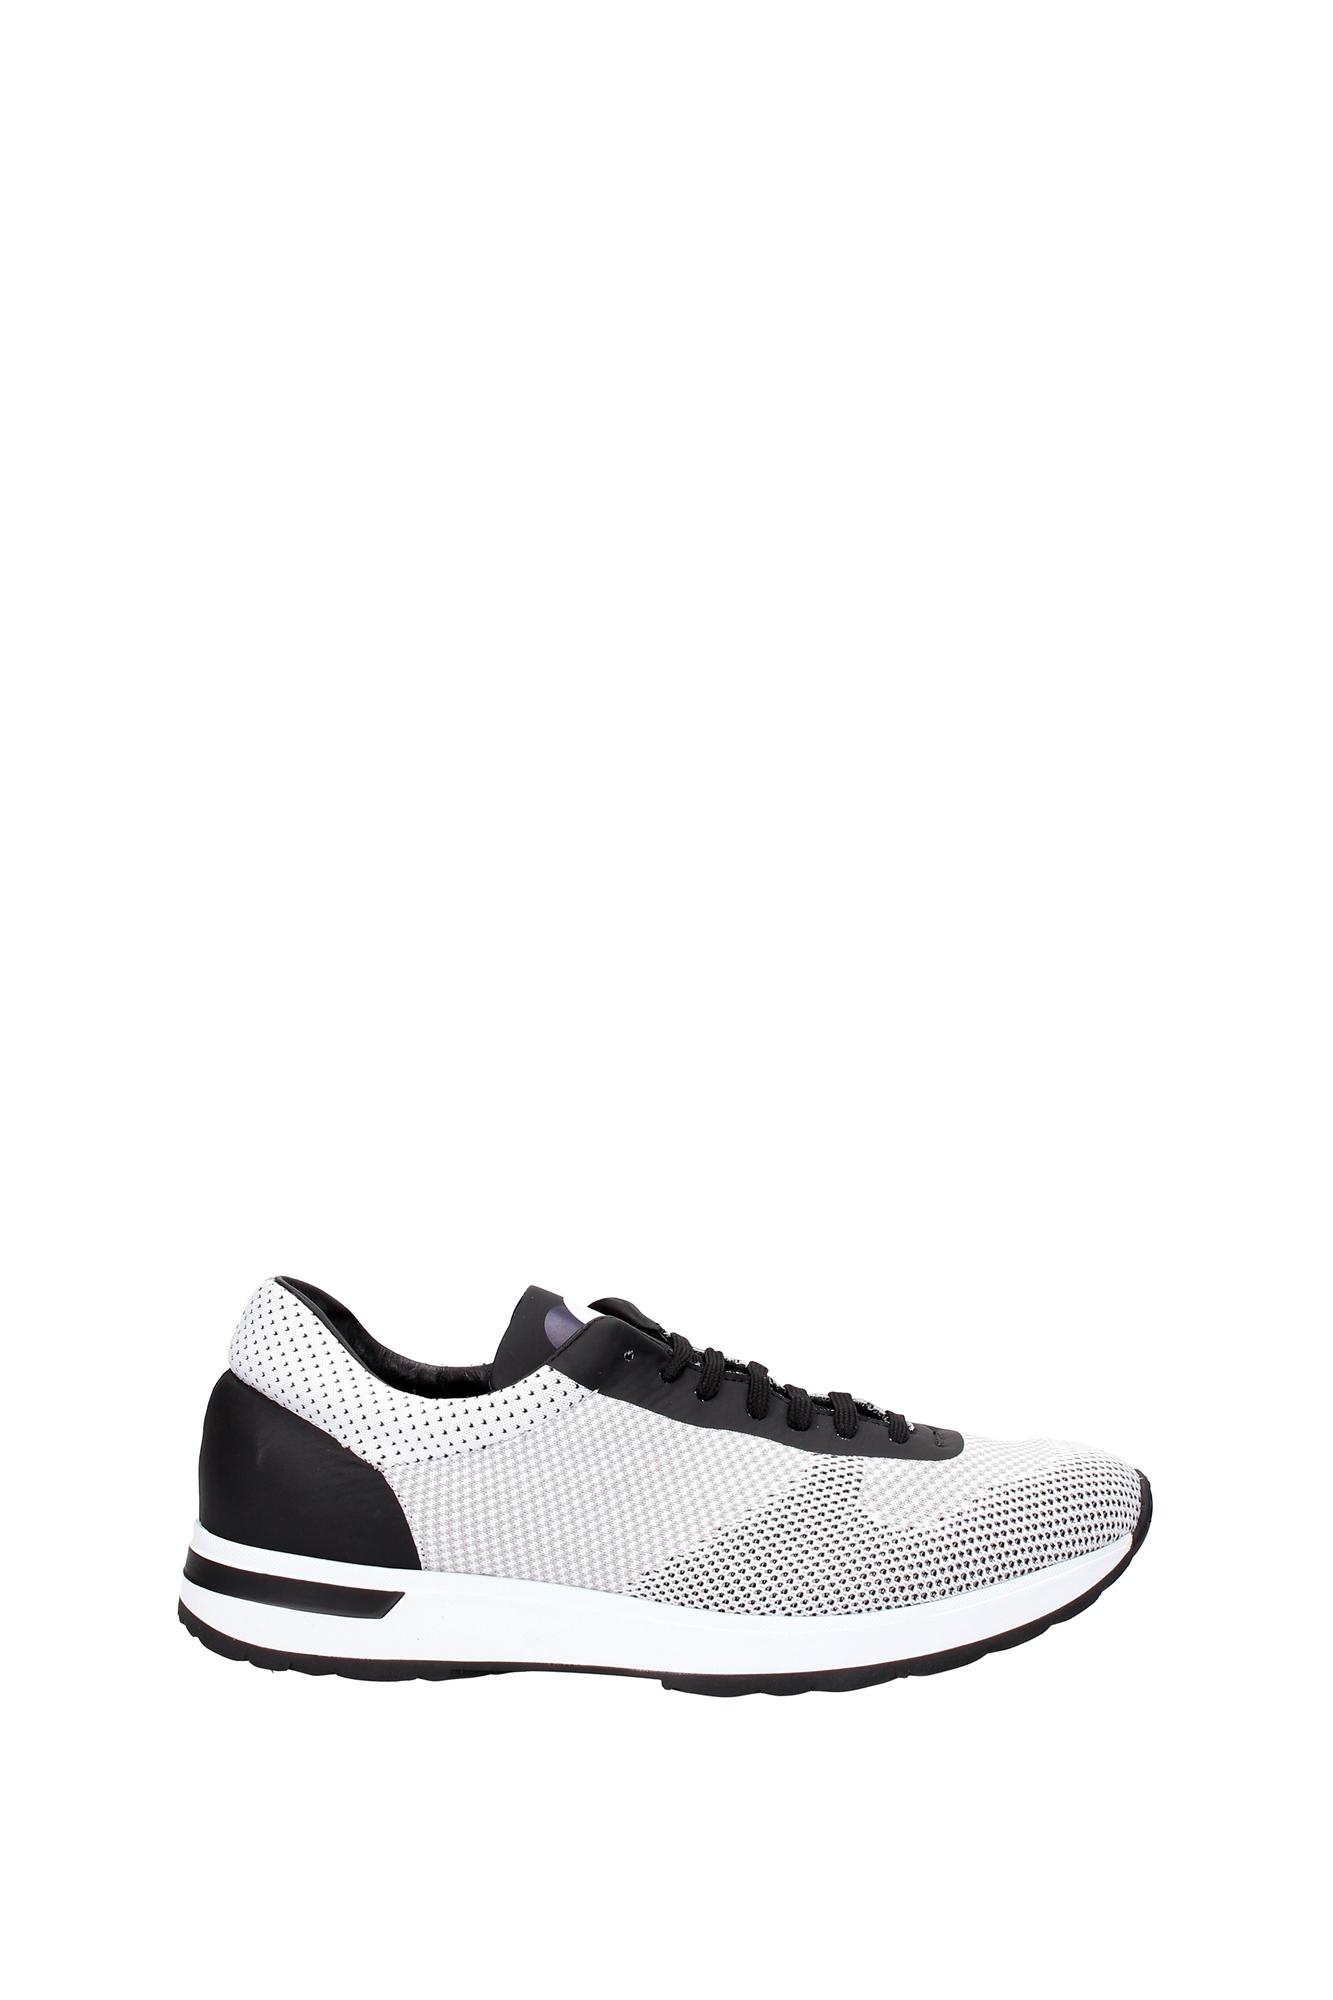 Sneakers Moncler Herren - - - Stoff (B109A101130007952002) 264713